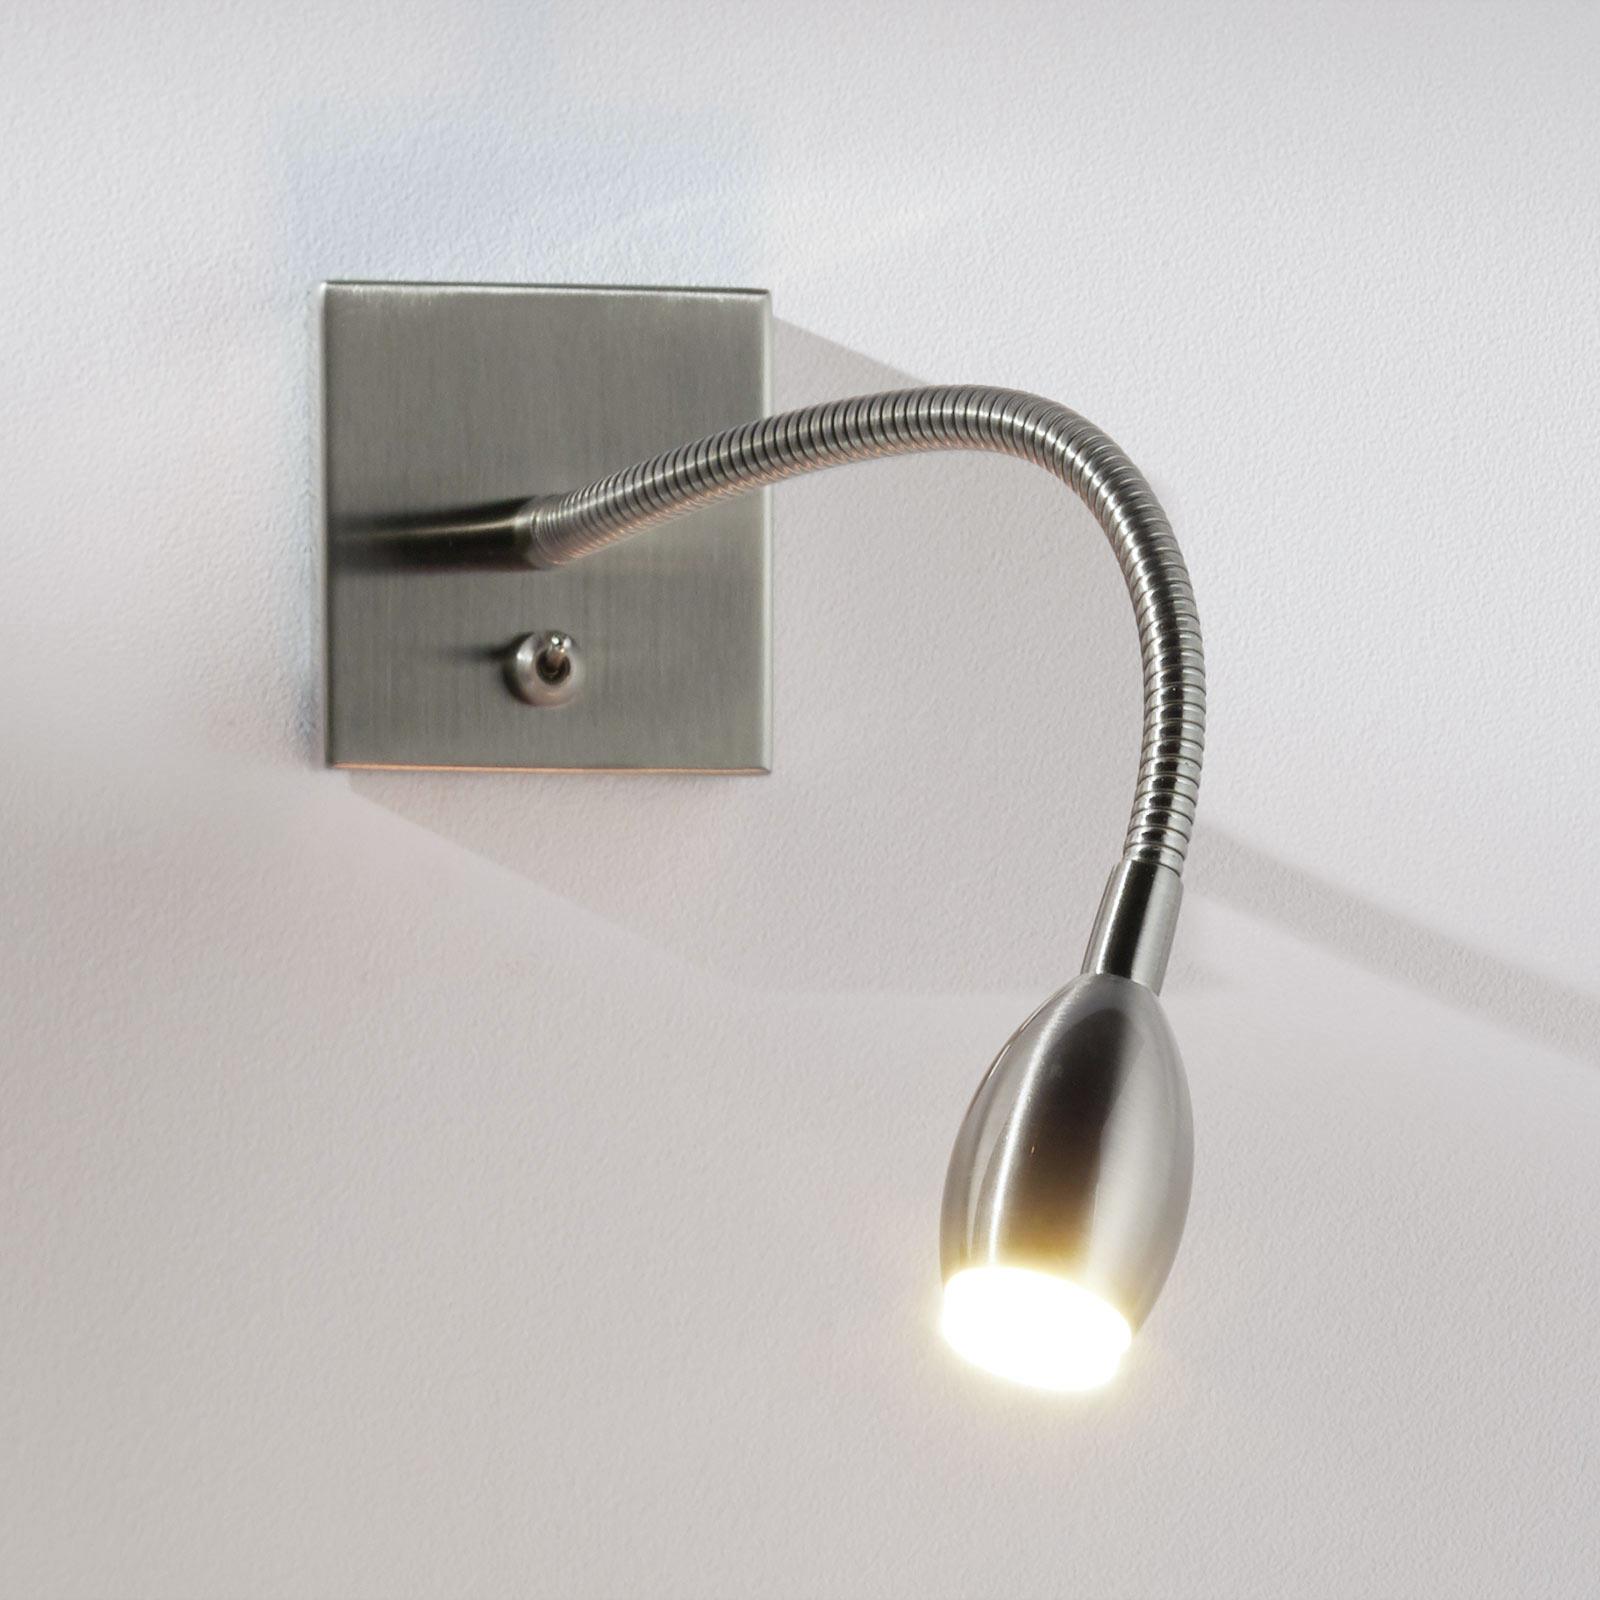 Nástenné LED svietidlo PILAR s flex ramenom nikel_1050007_1